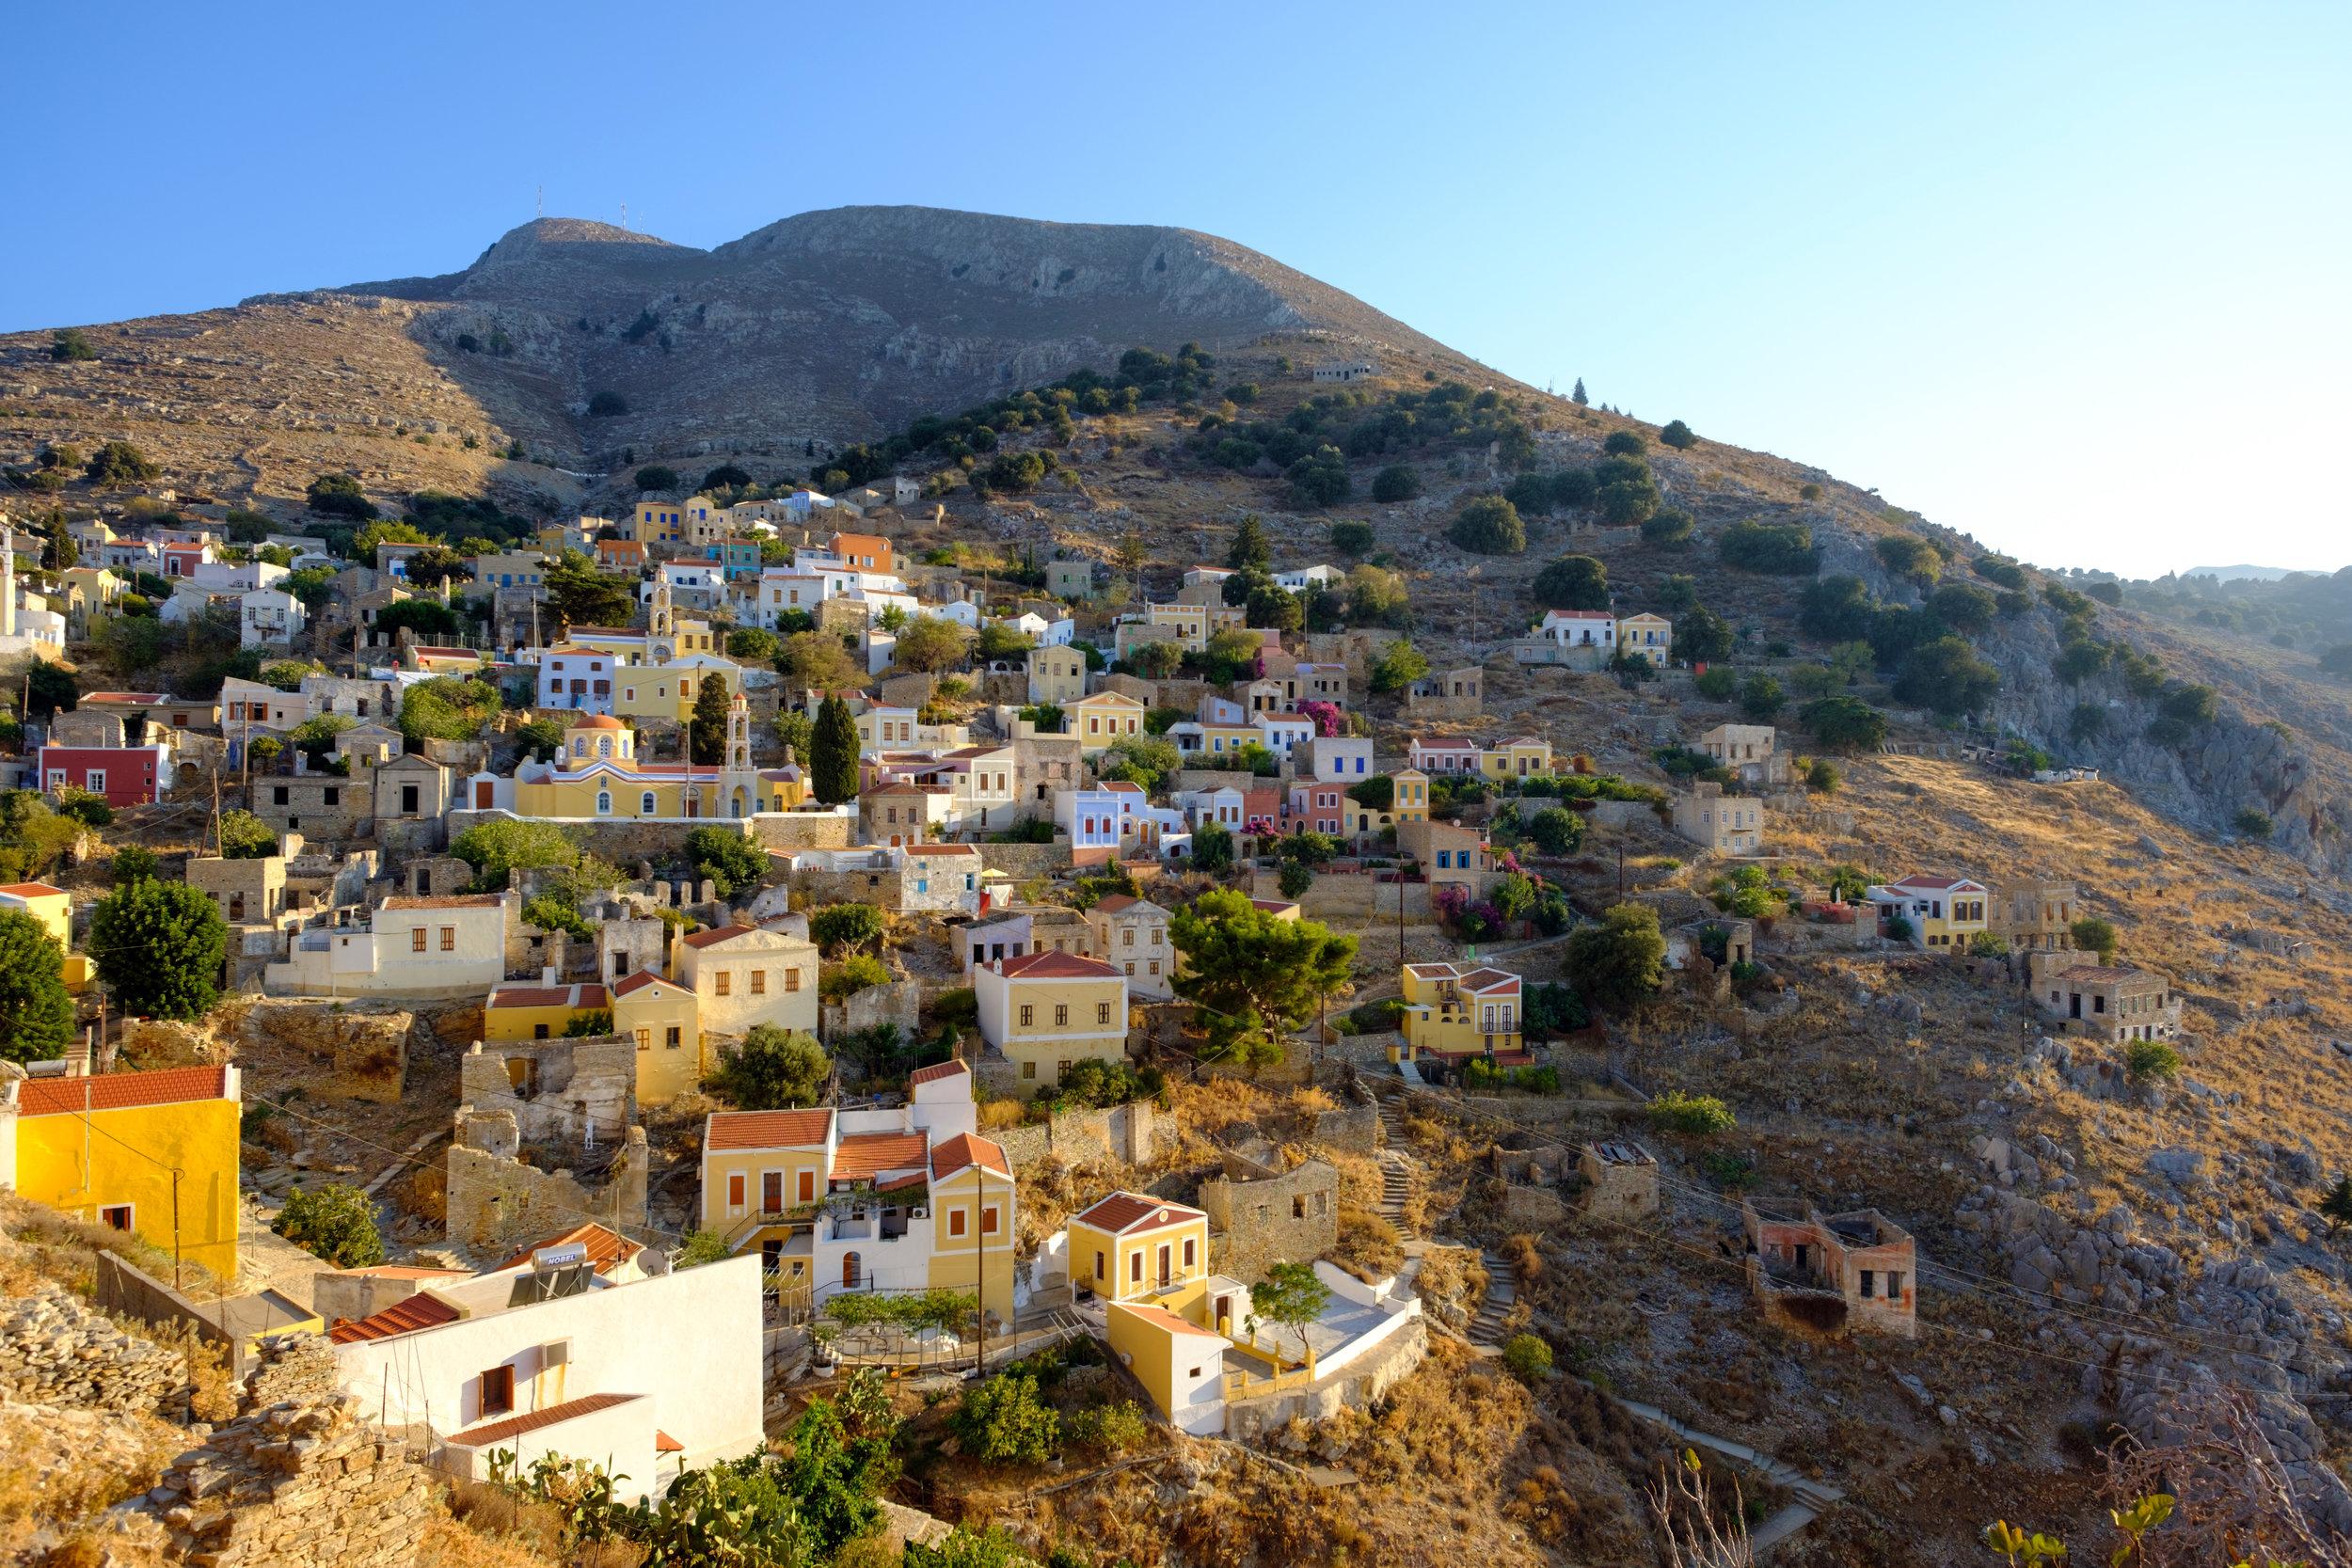 Symi , Greece, Fujifilm X-Pro2, XF 14mm f/2.8 R @ f/5.6